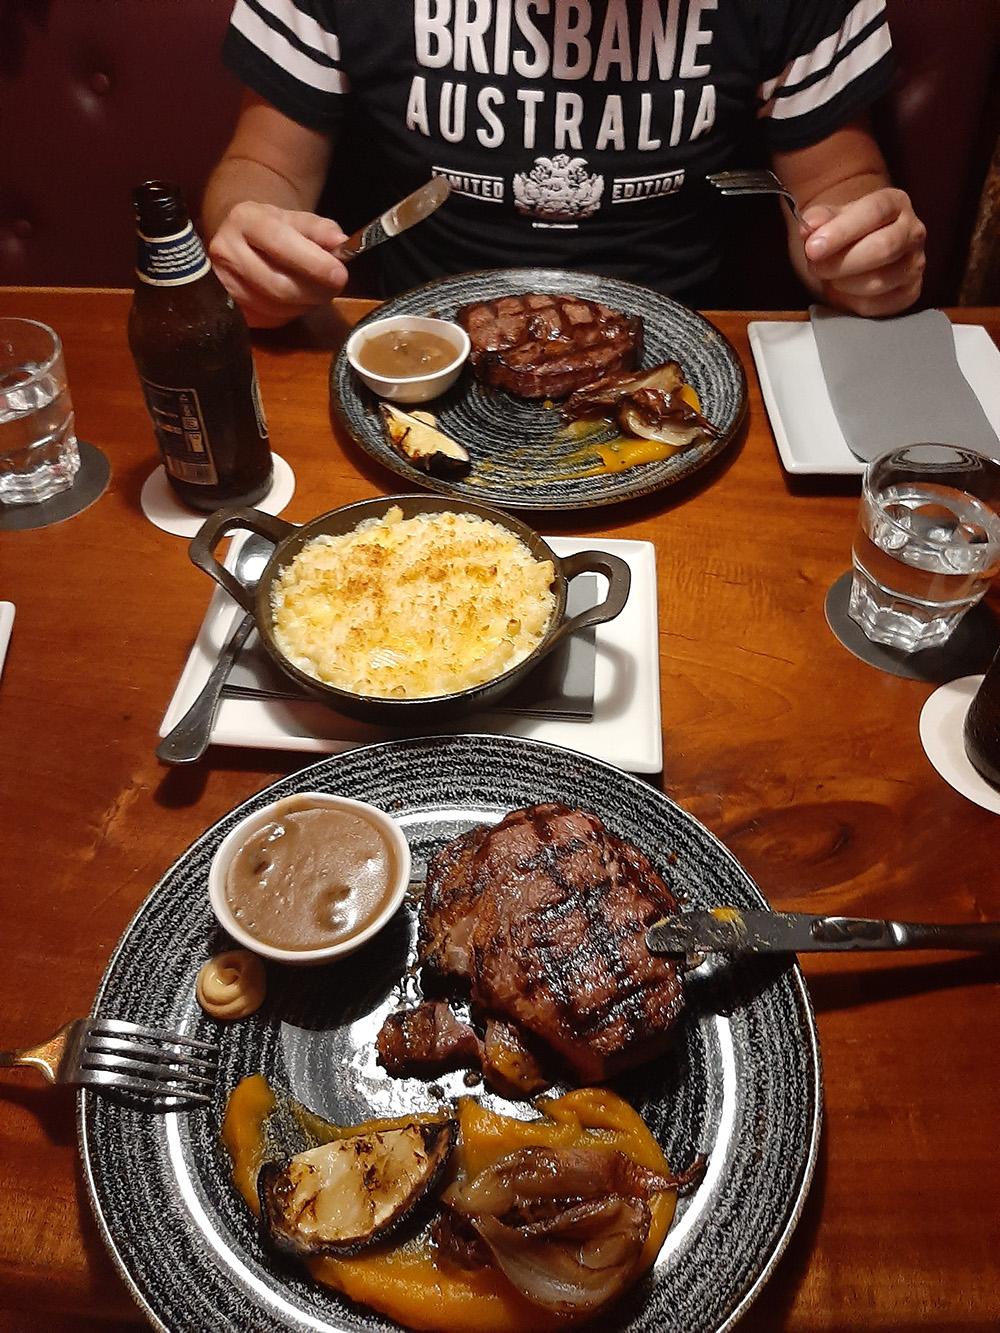 Enjoying a delicious tender steak at Iron Bar